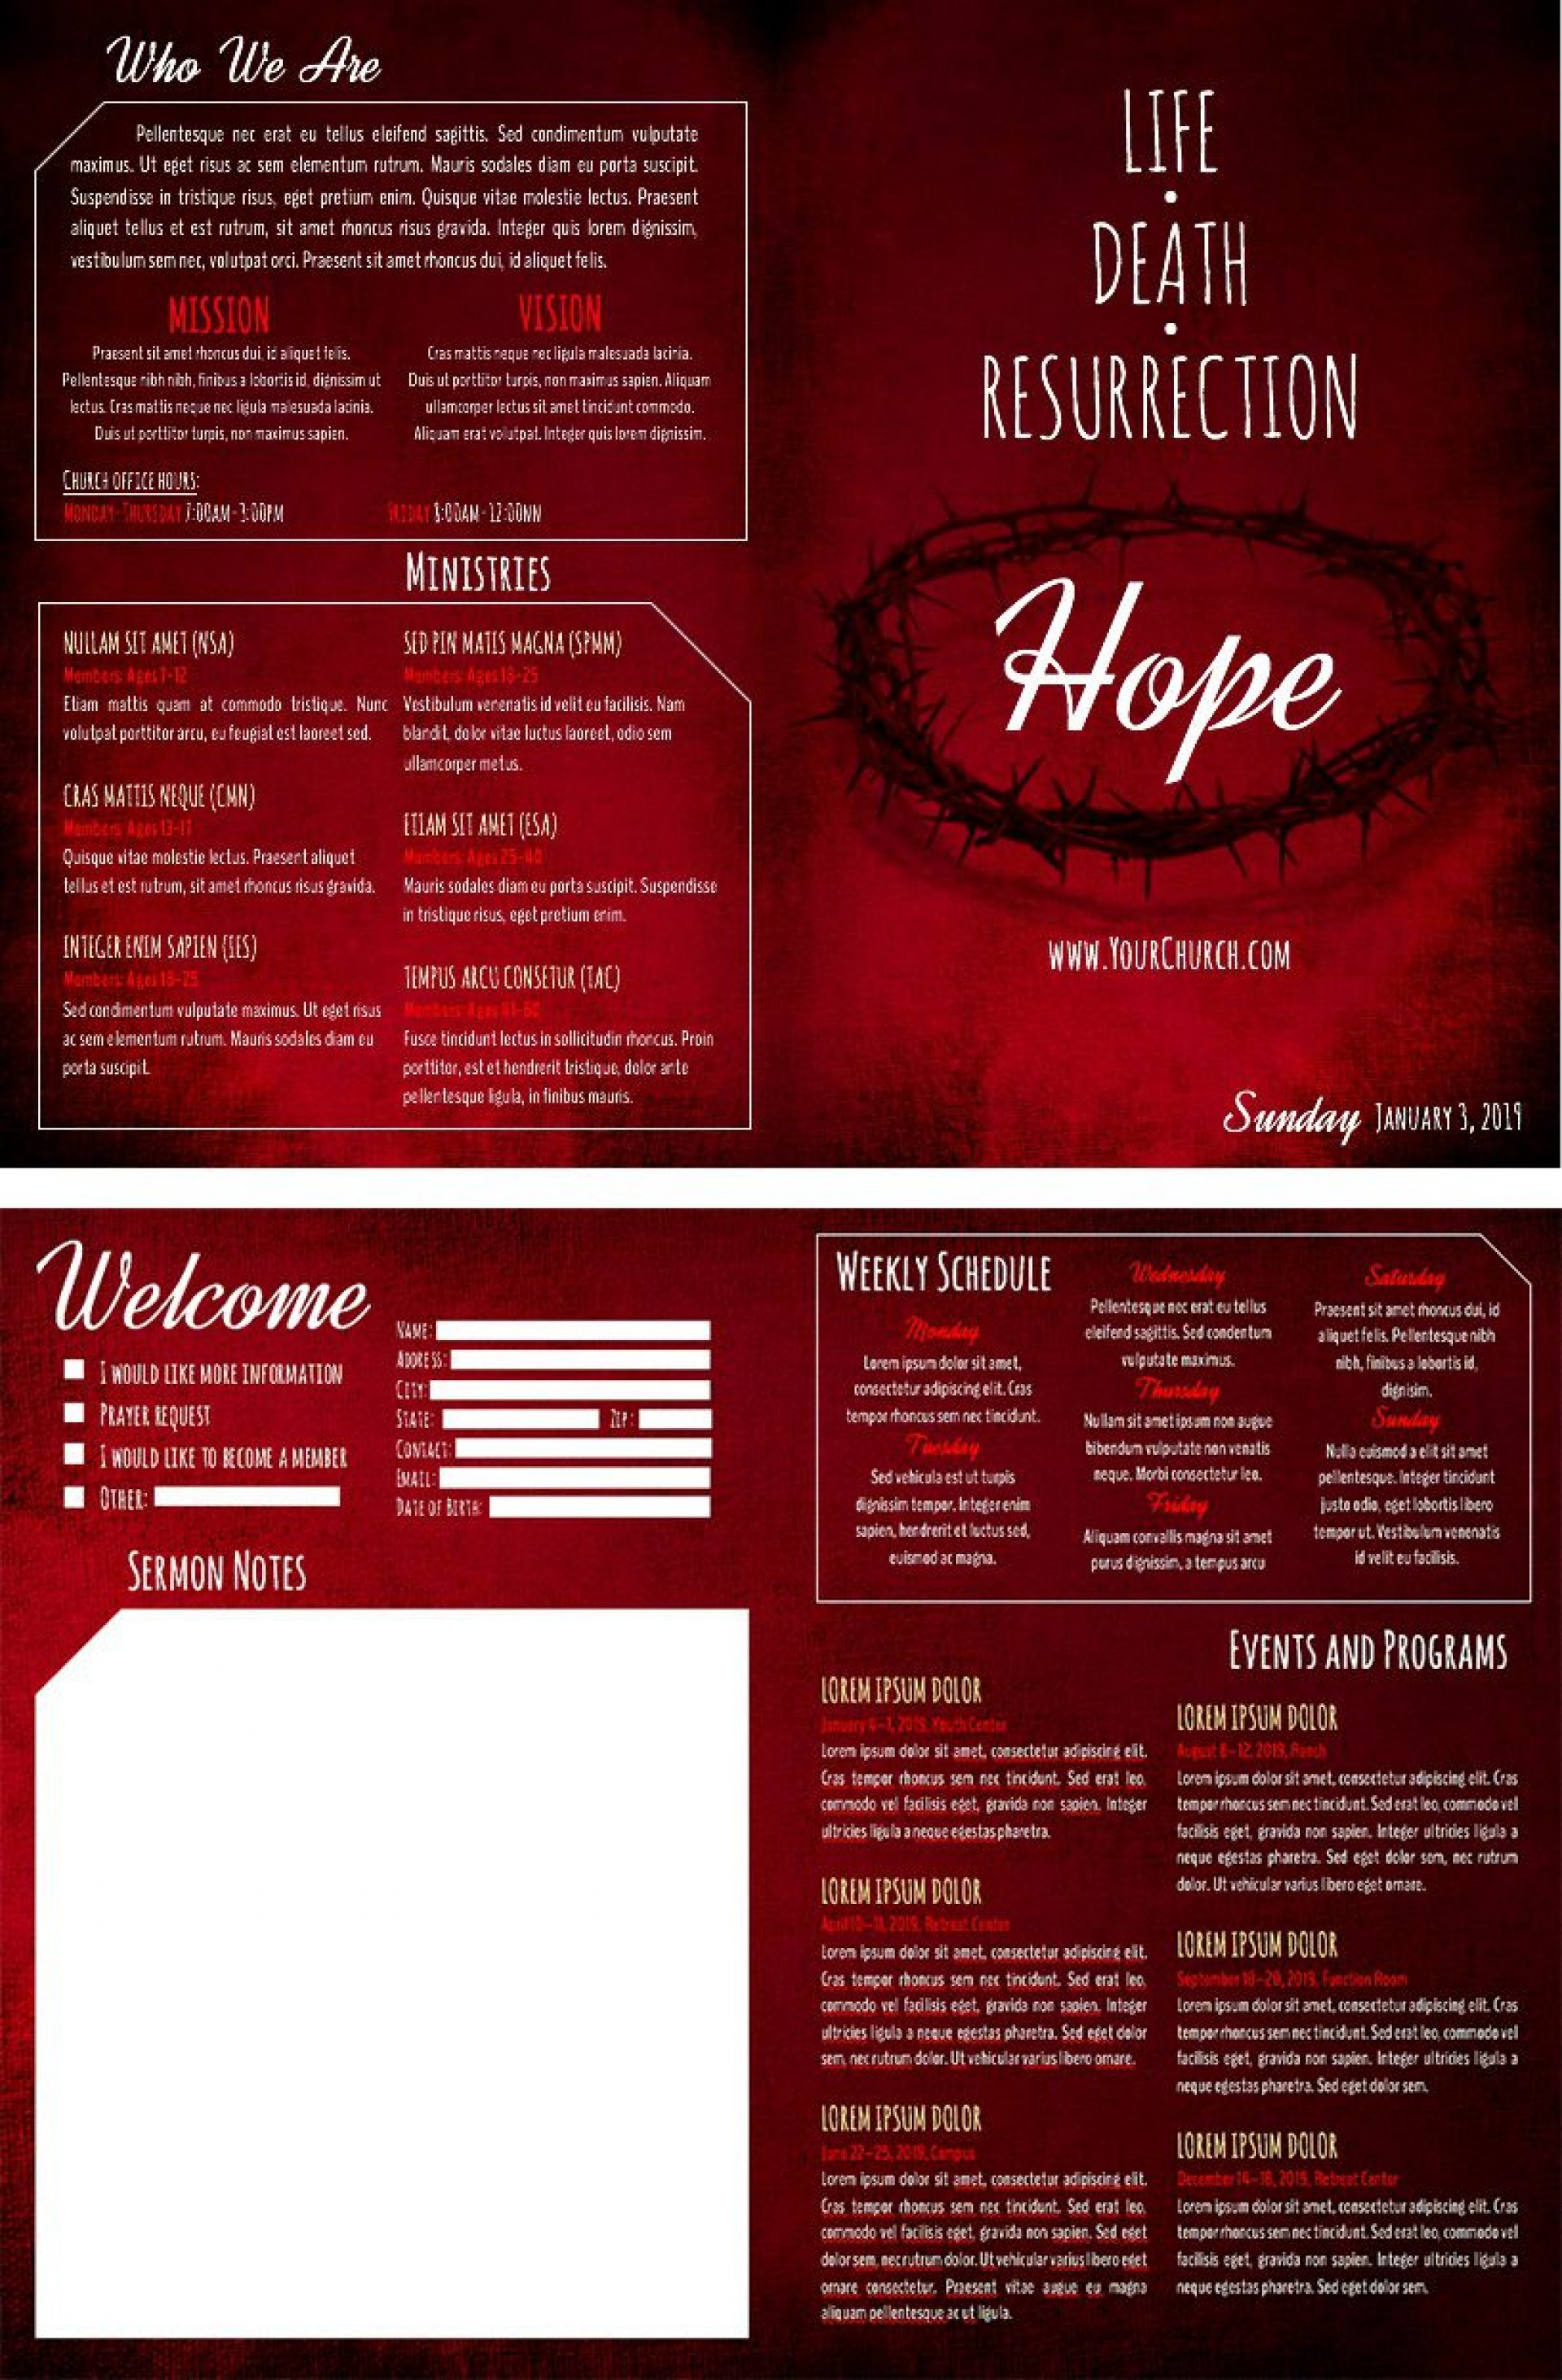 003 Stunning Free Church Program Template High Resolution  Printable Anniversary Doc1920